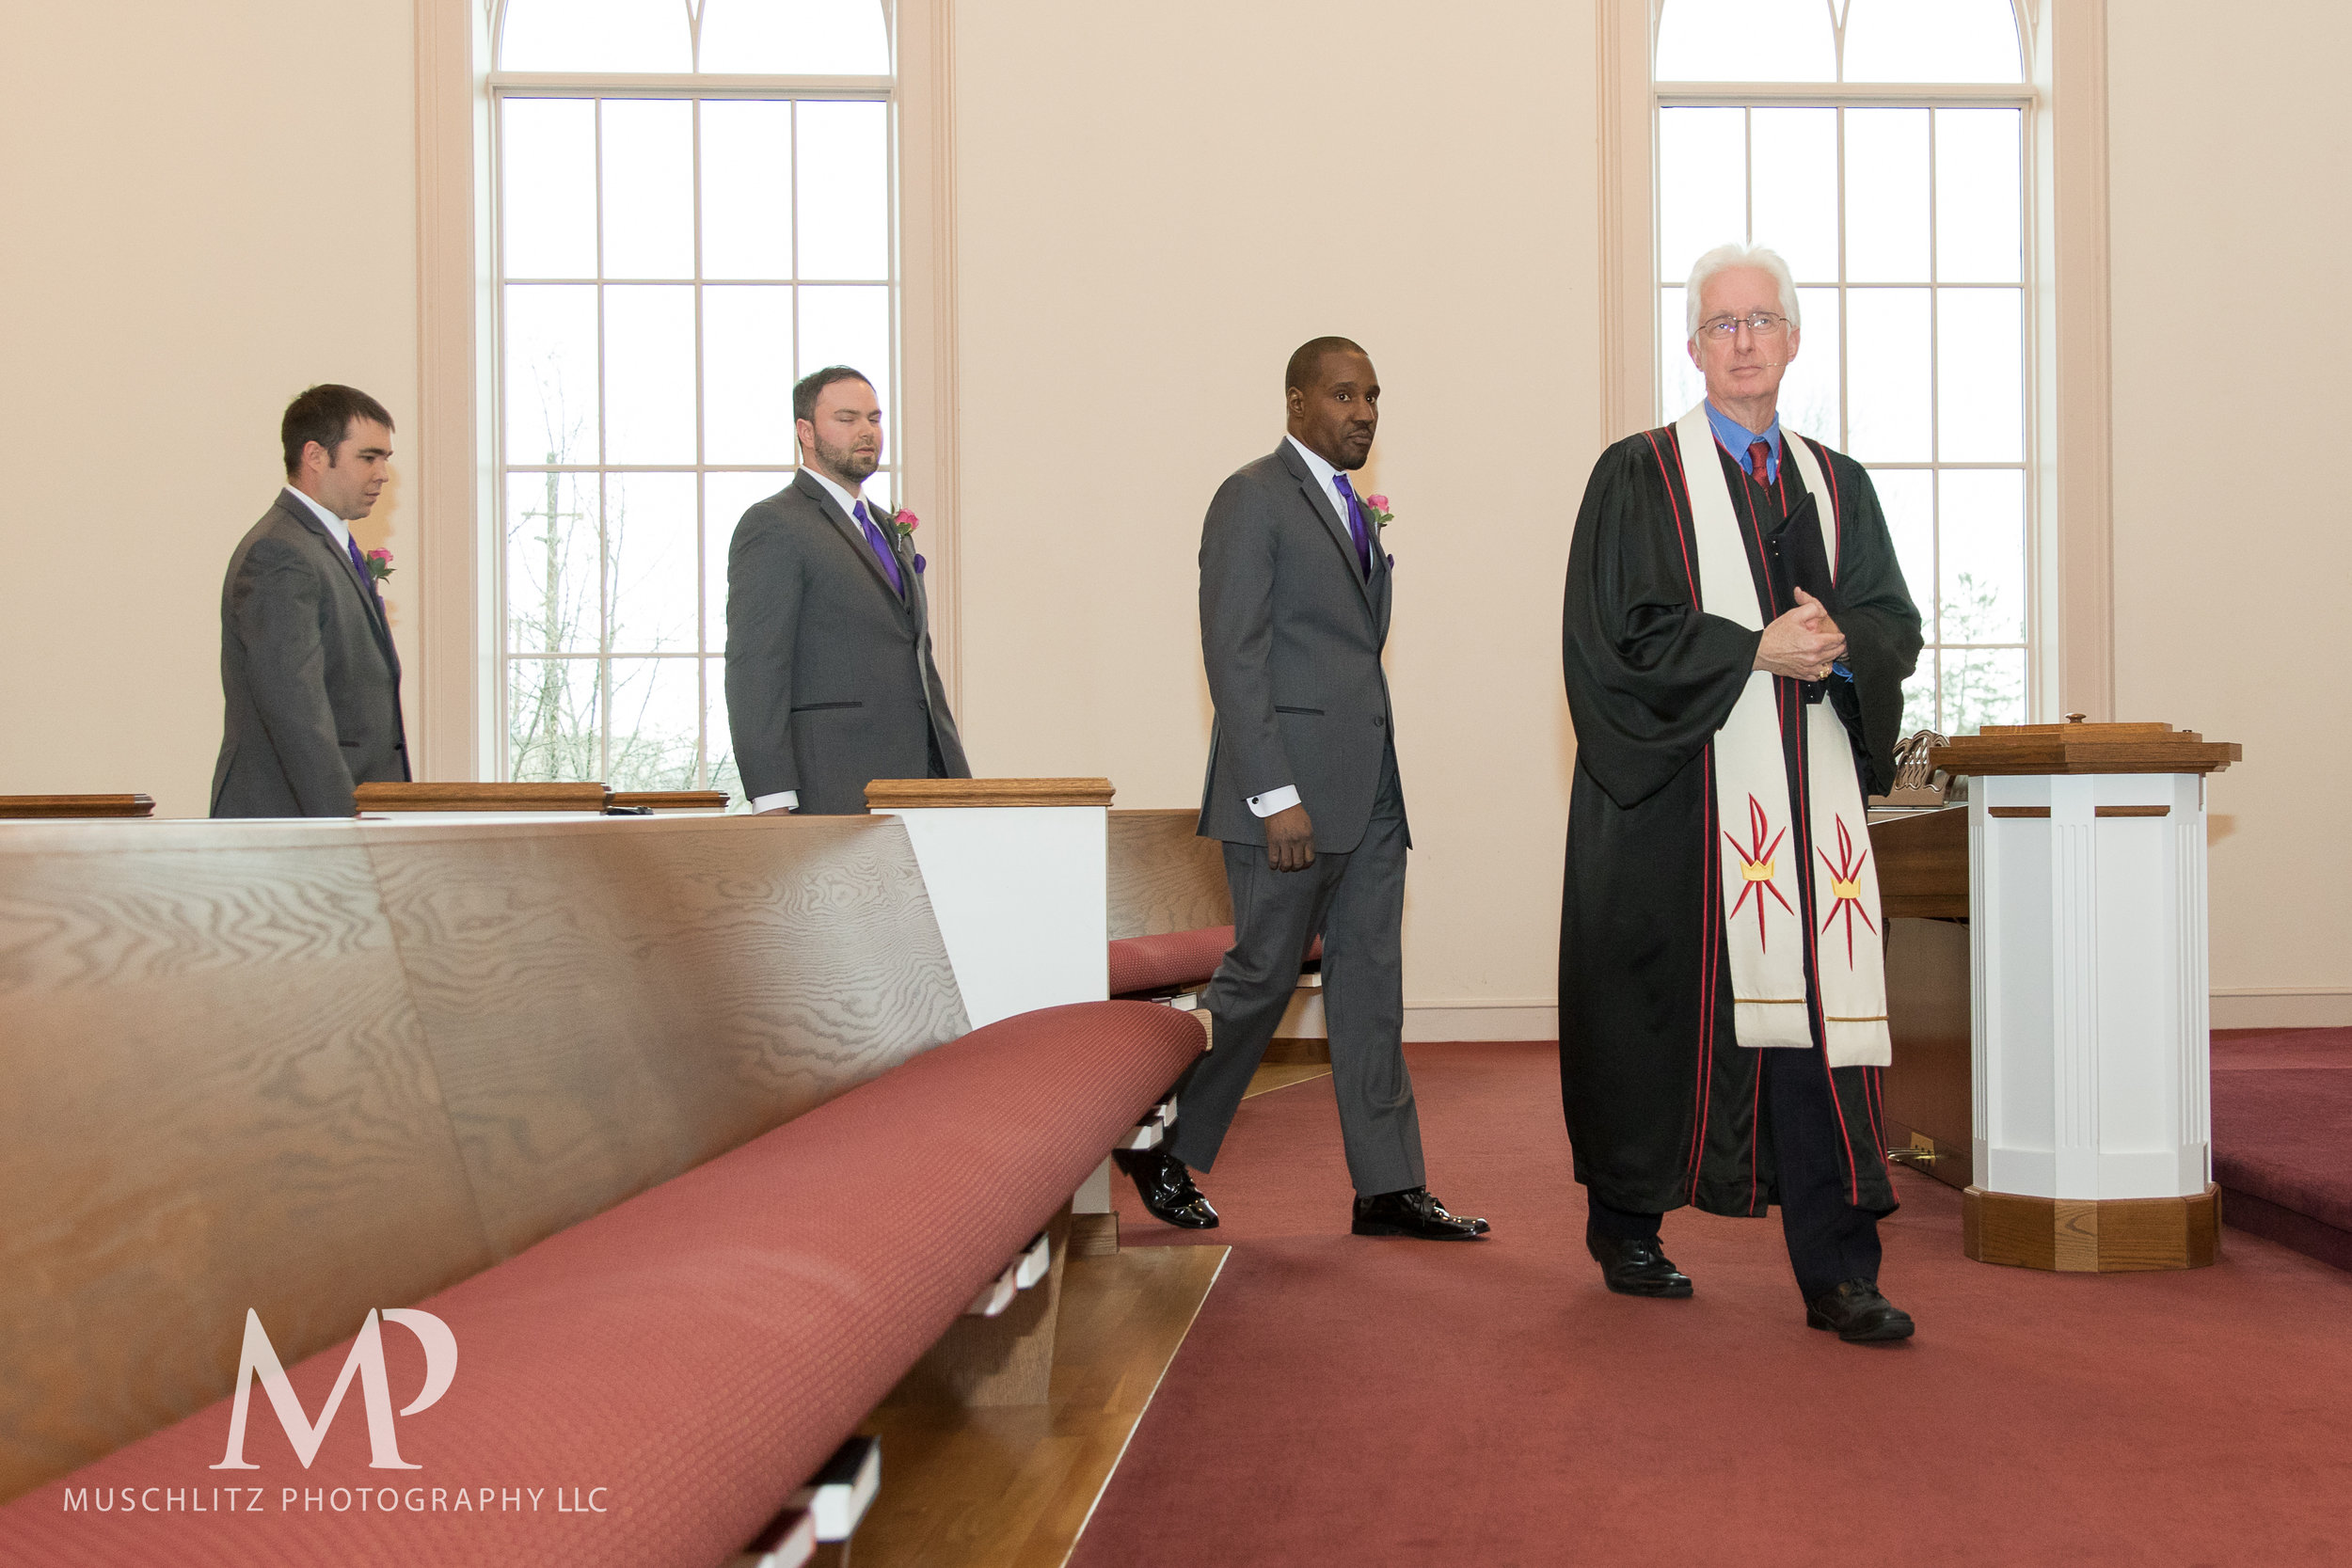 dublin-community-church-wedding-columbus-ohio-muschlitz-photography-028.JPG